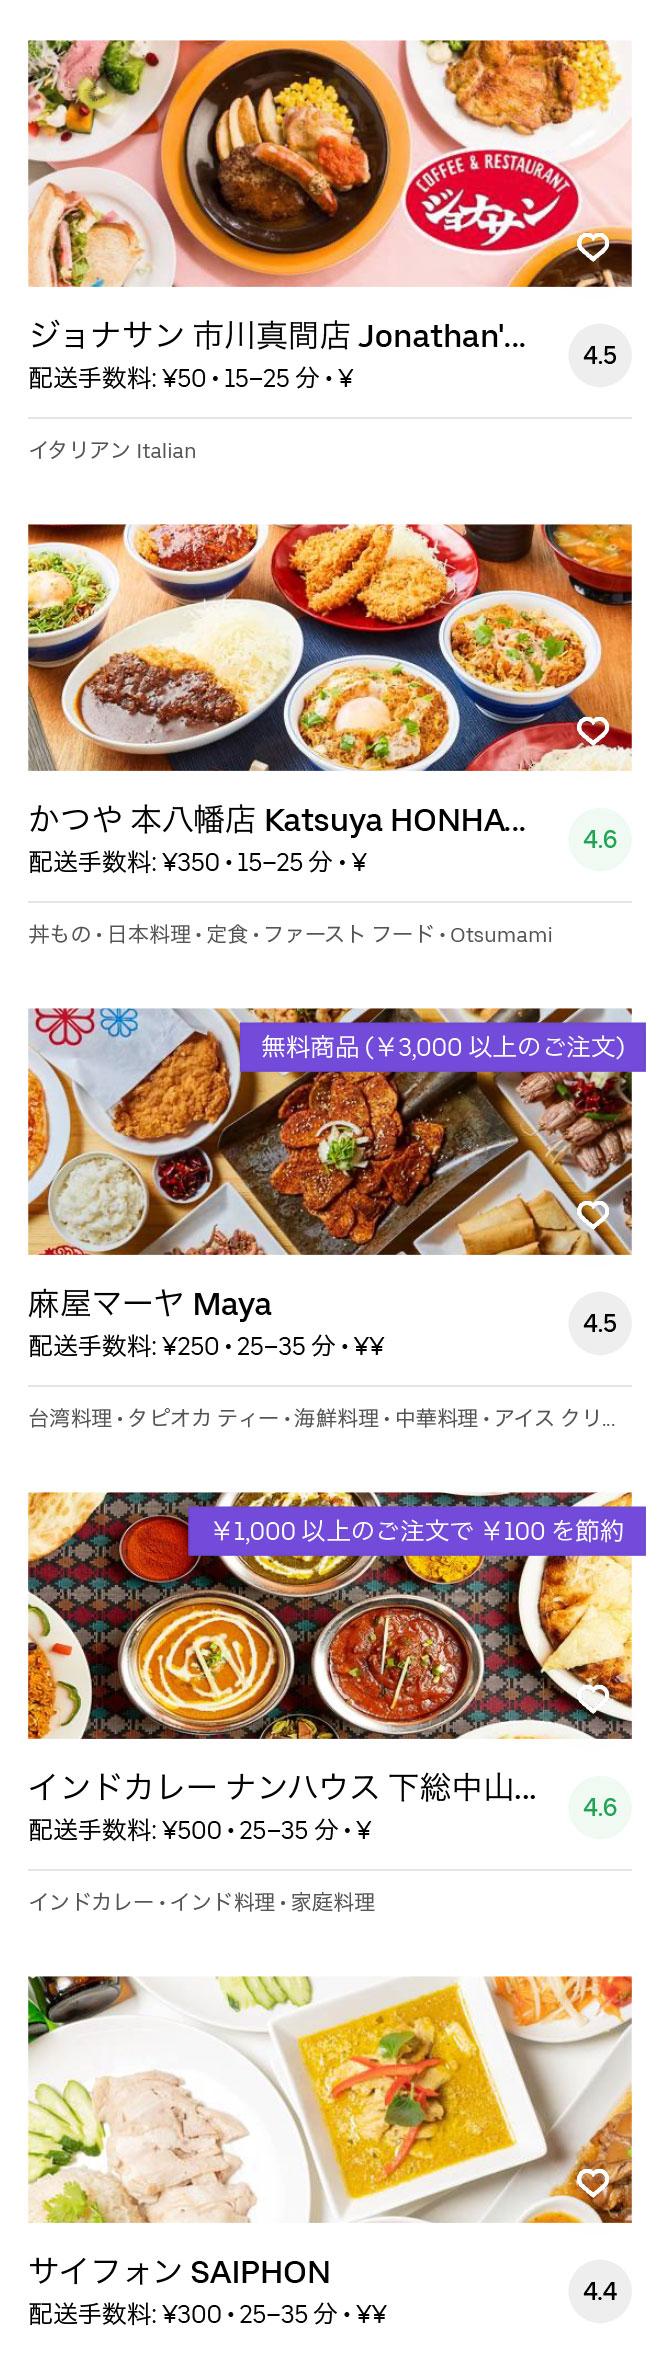 Ichikawa menu 2004 07